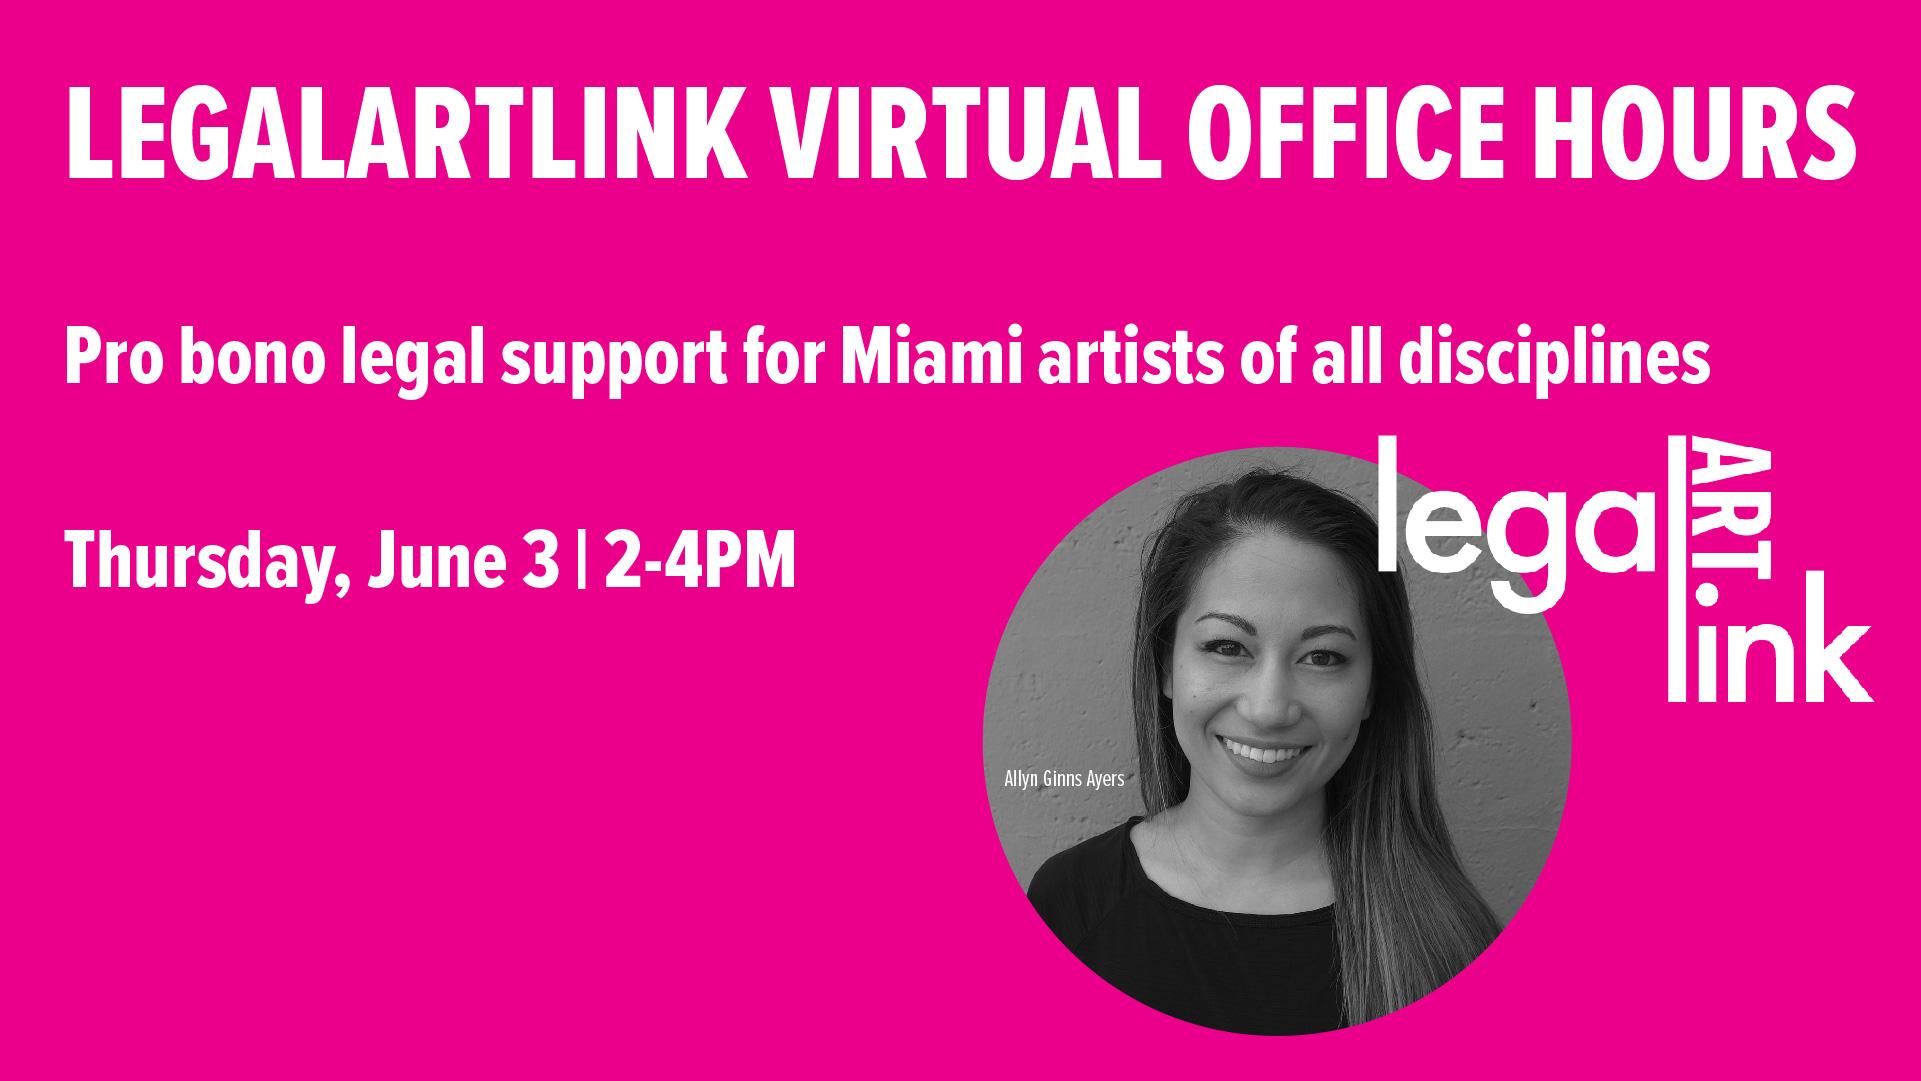 LegalARTLink Virtual Office Hours